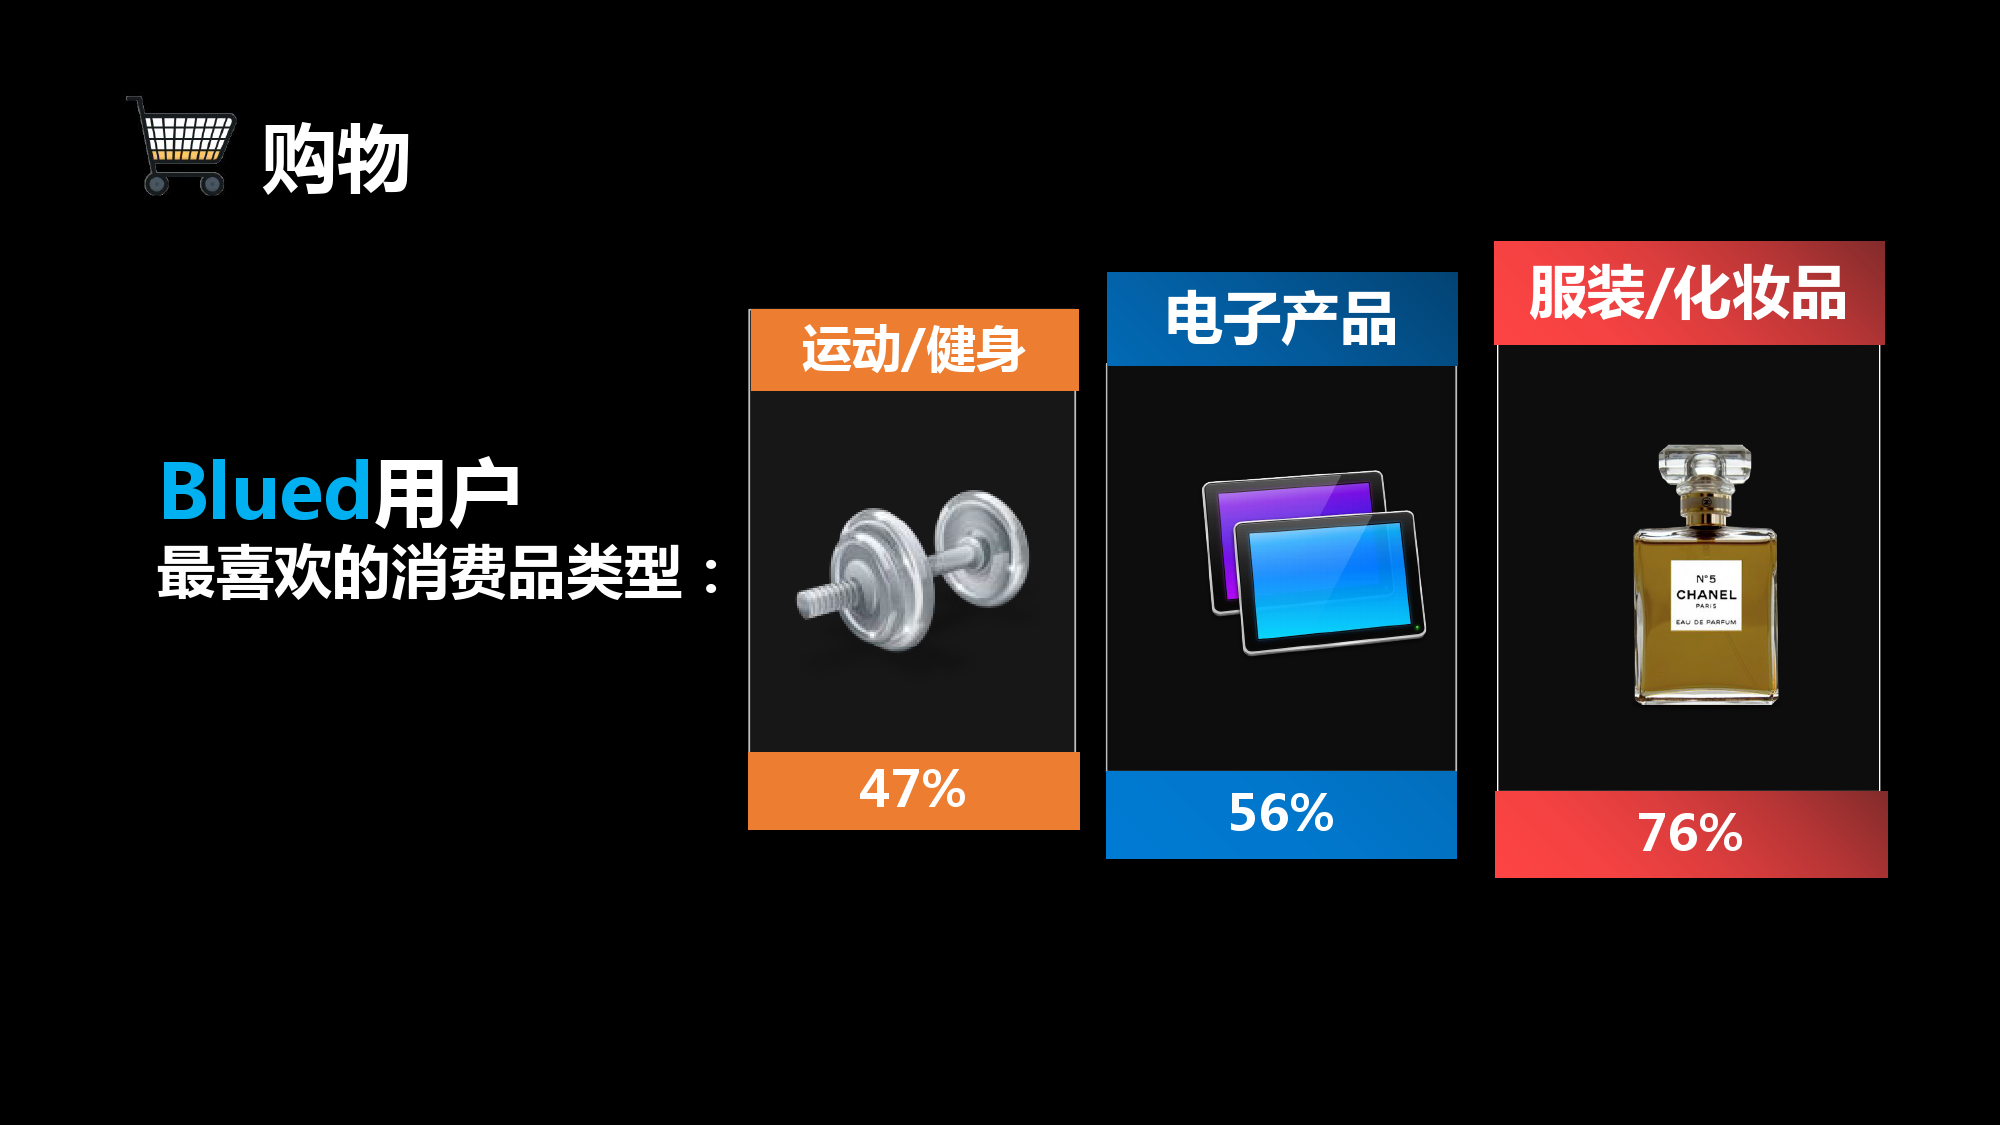 Blued2015中国同志社群大数据白皮书_000016